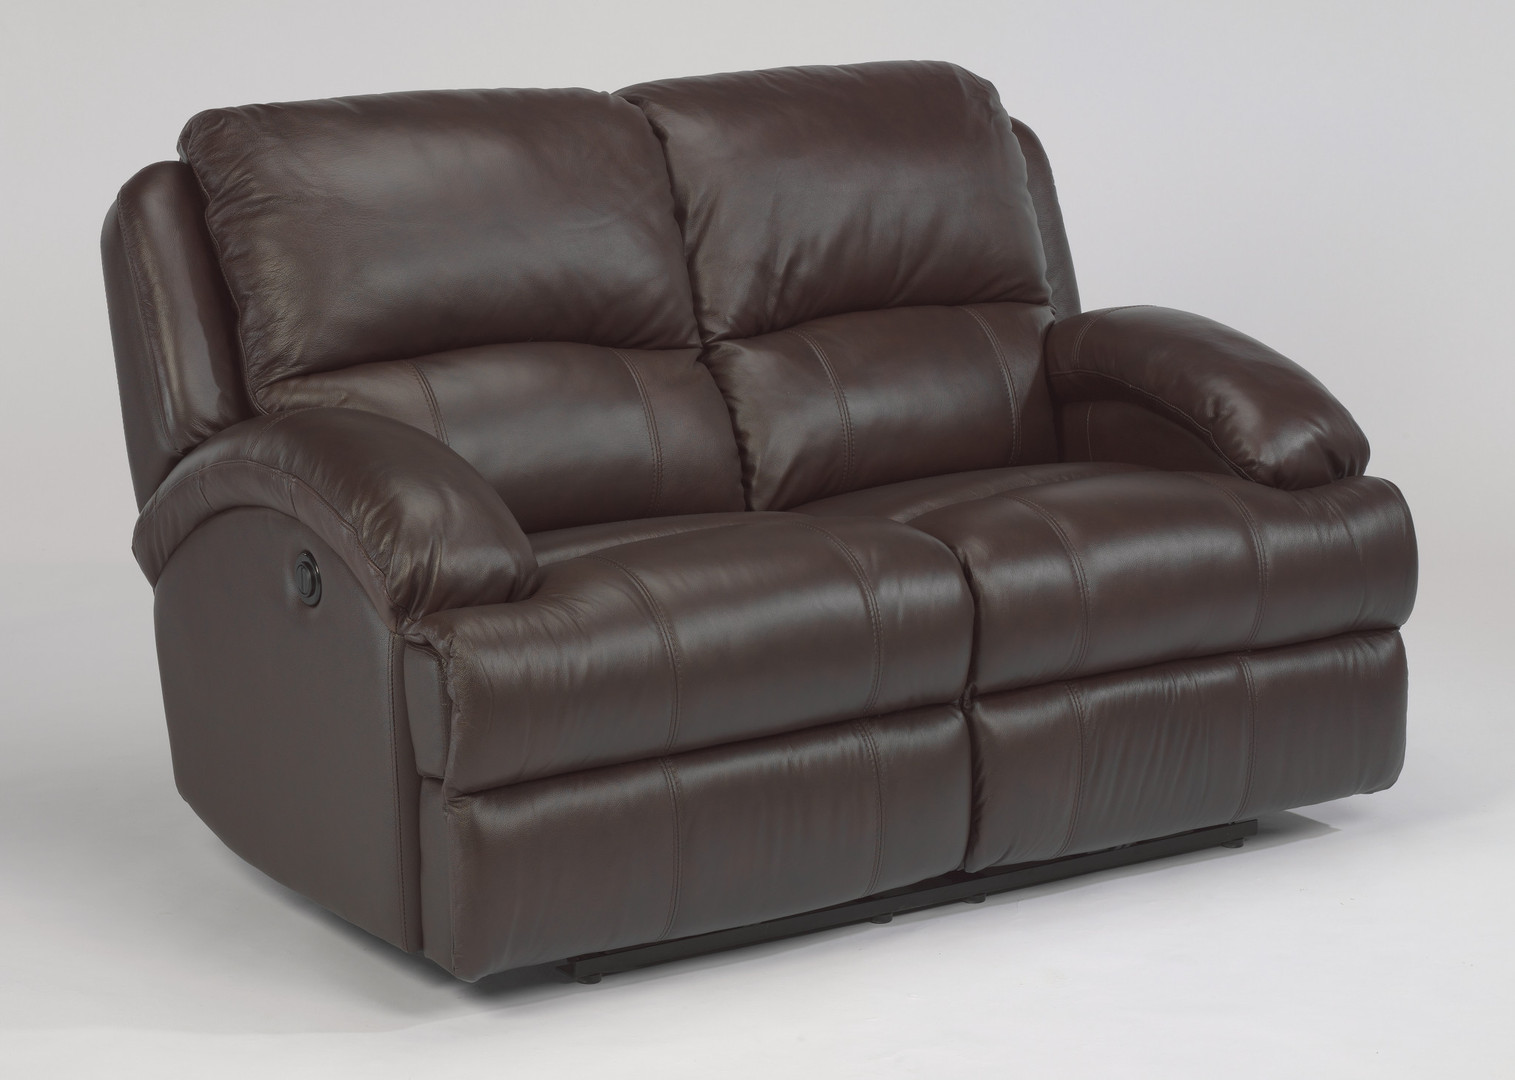 flexsteel julio reclining sofa pro seda hazienda sofas loveseats and recliners bailey 39s discount center